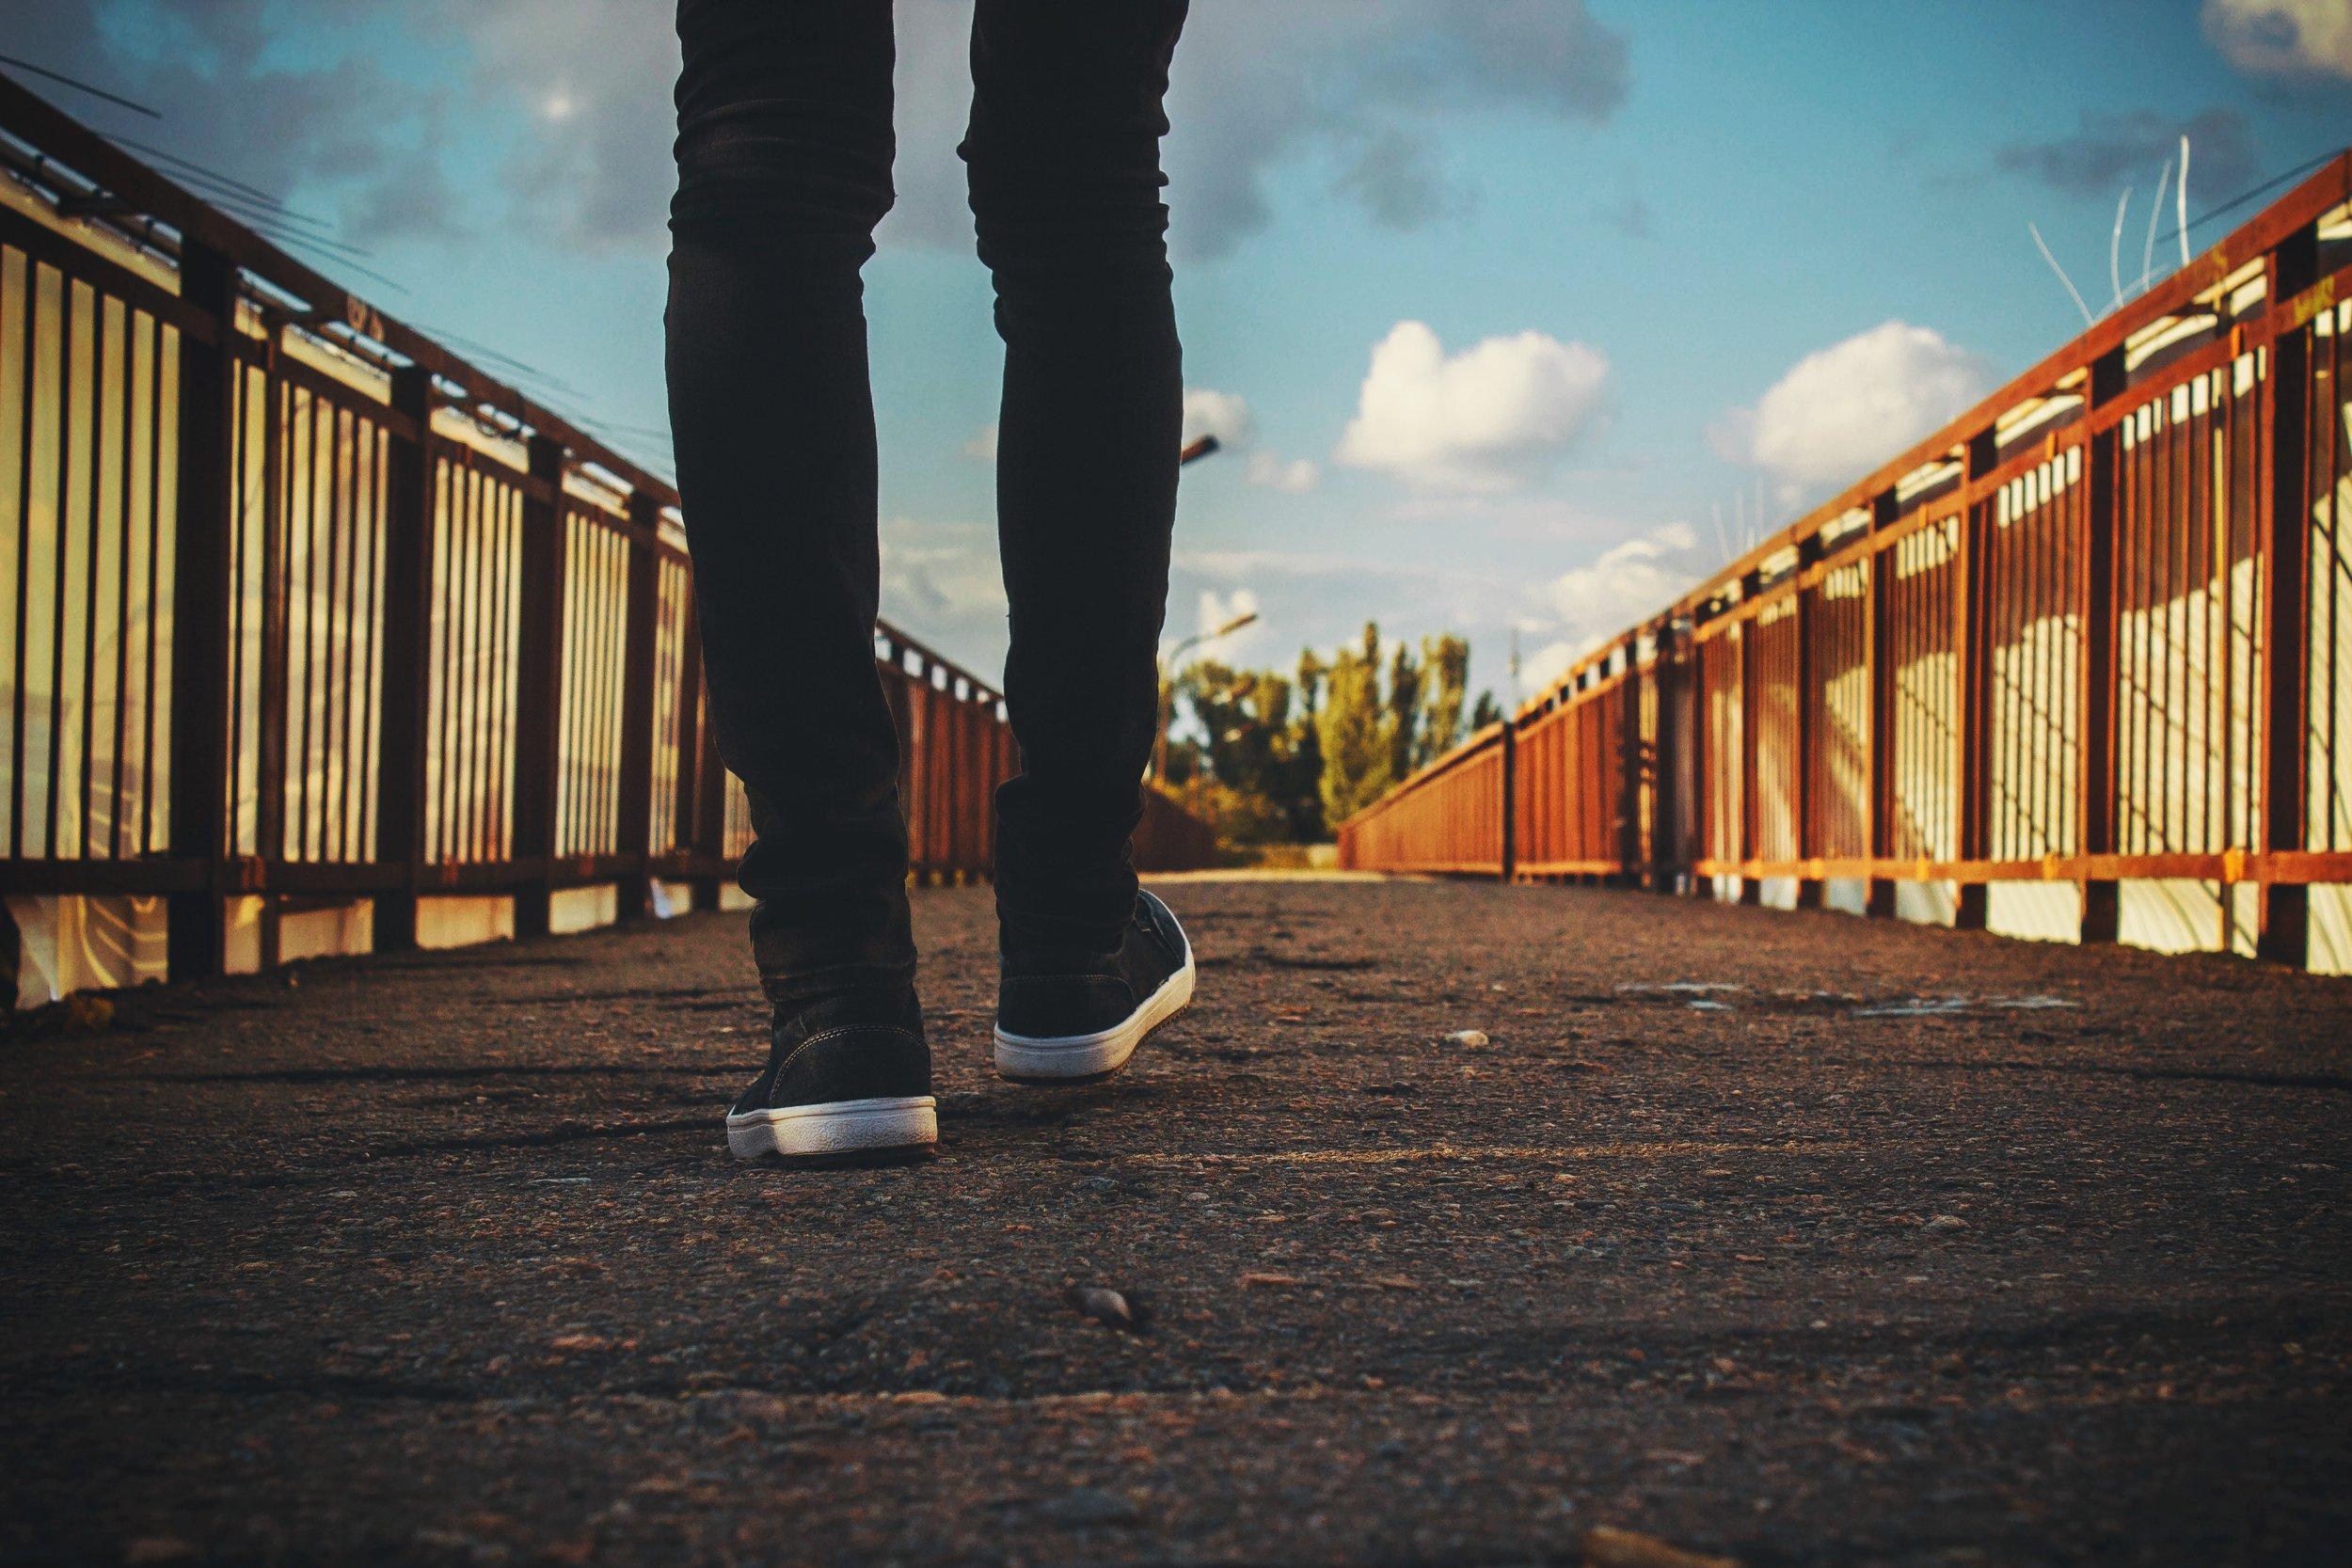 bridge-feet-railings-244371.jpg